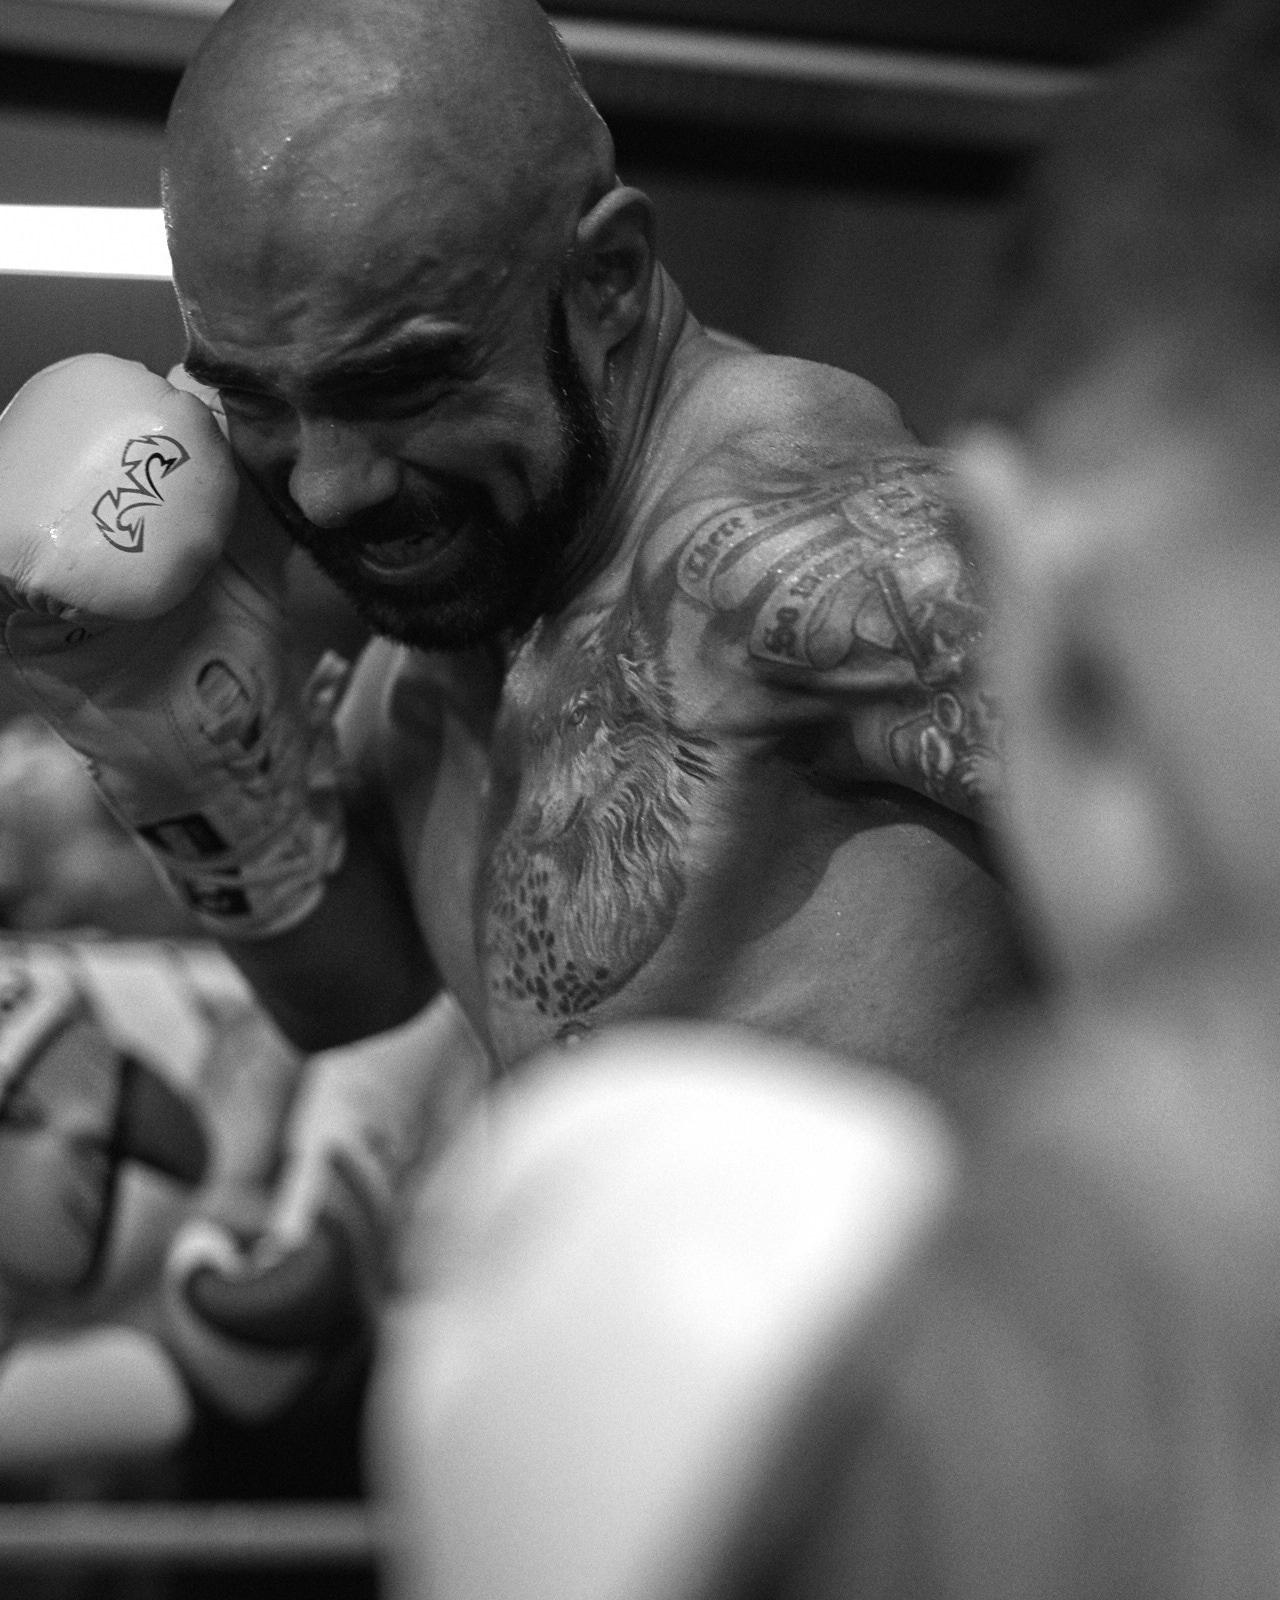 201002_ian_boxing_0484